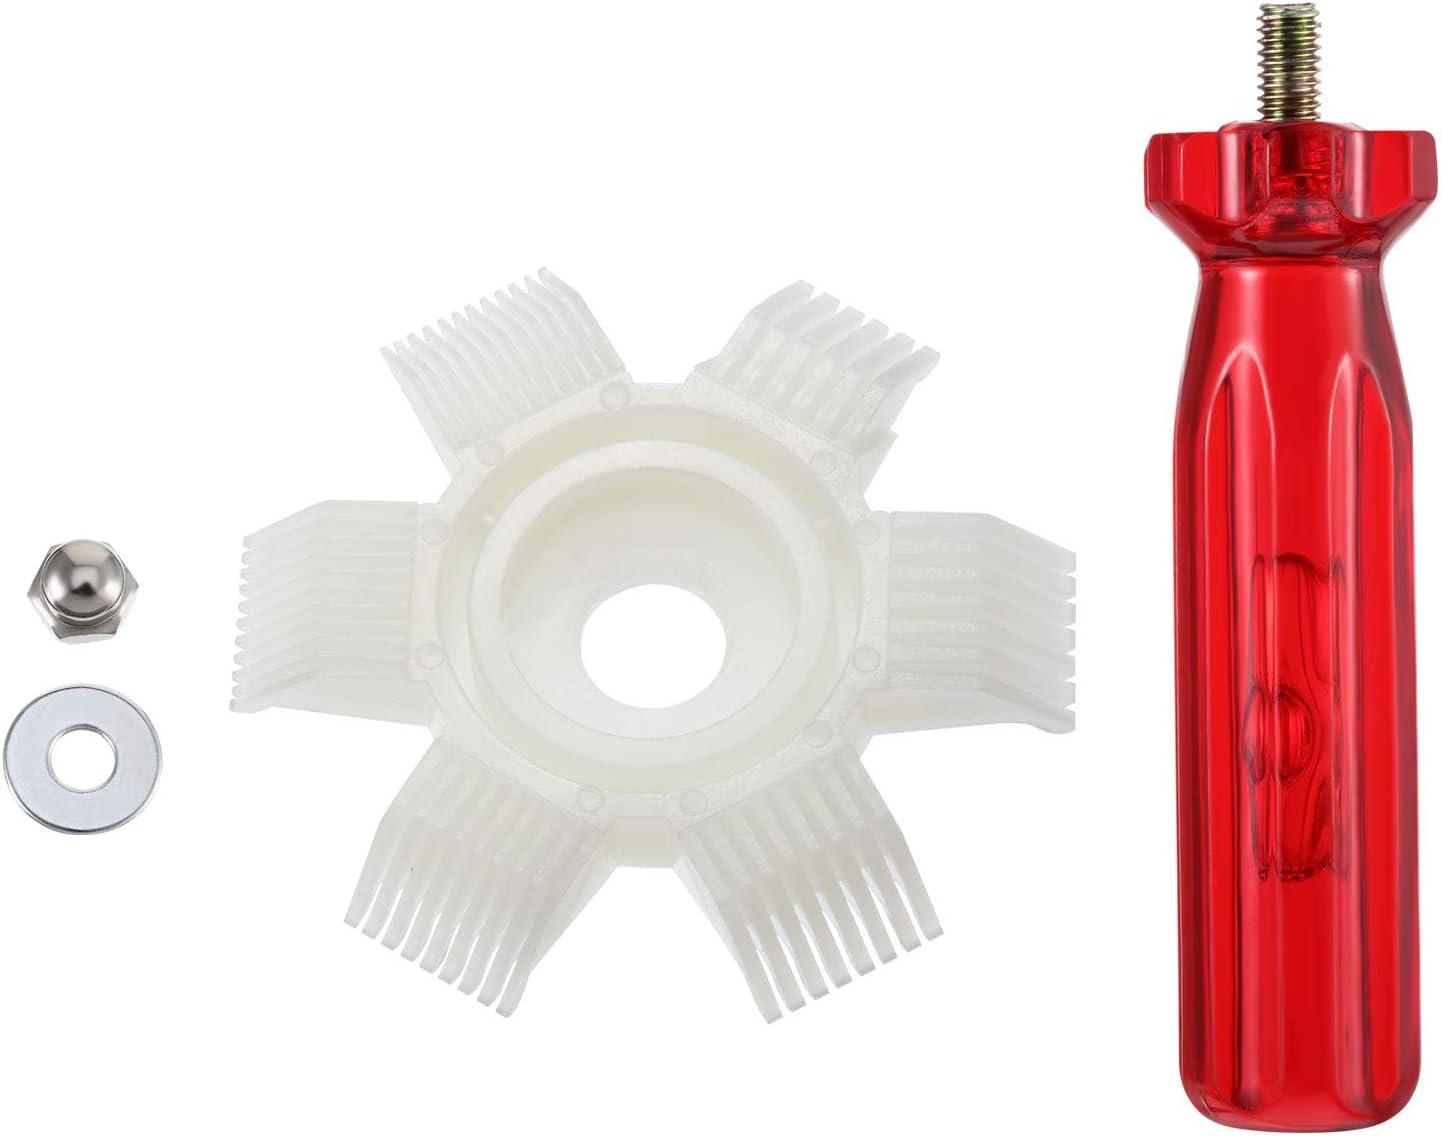 2 Sets Frienda Condenser Fin Straightener AC Fin Comb Air Conditioner Radiator for Cleaning Radiator Evaporator